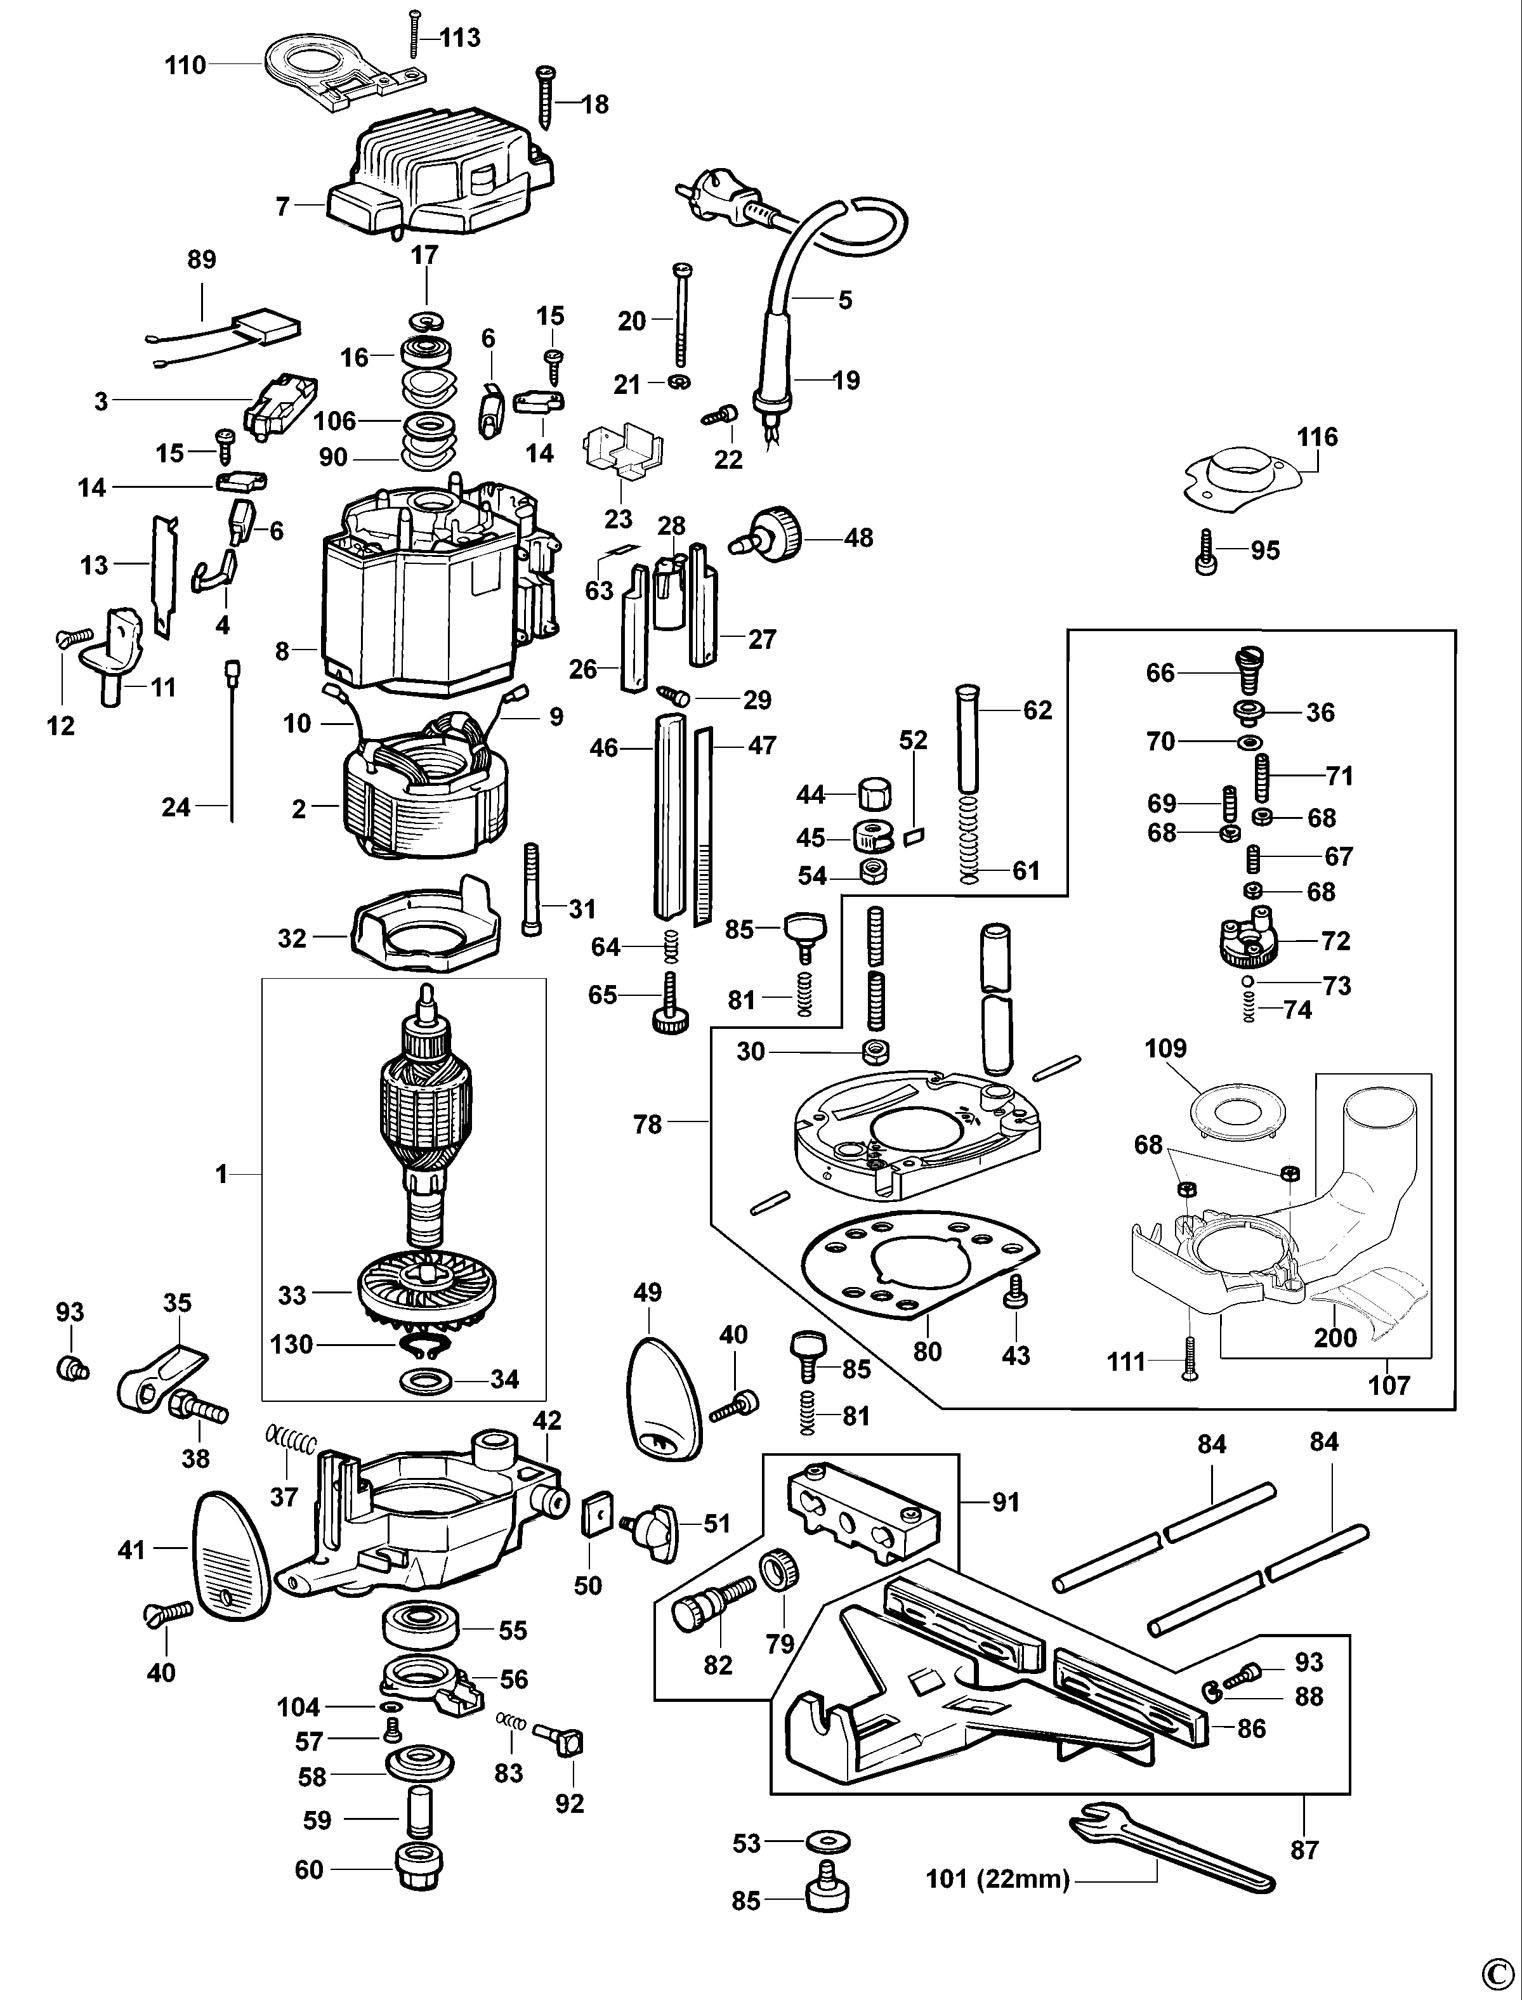 Spares For Dewalt Dw624 Router Type 1 Spare Dw624 Type 1